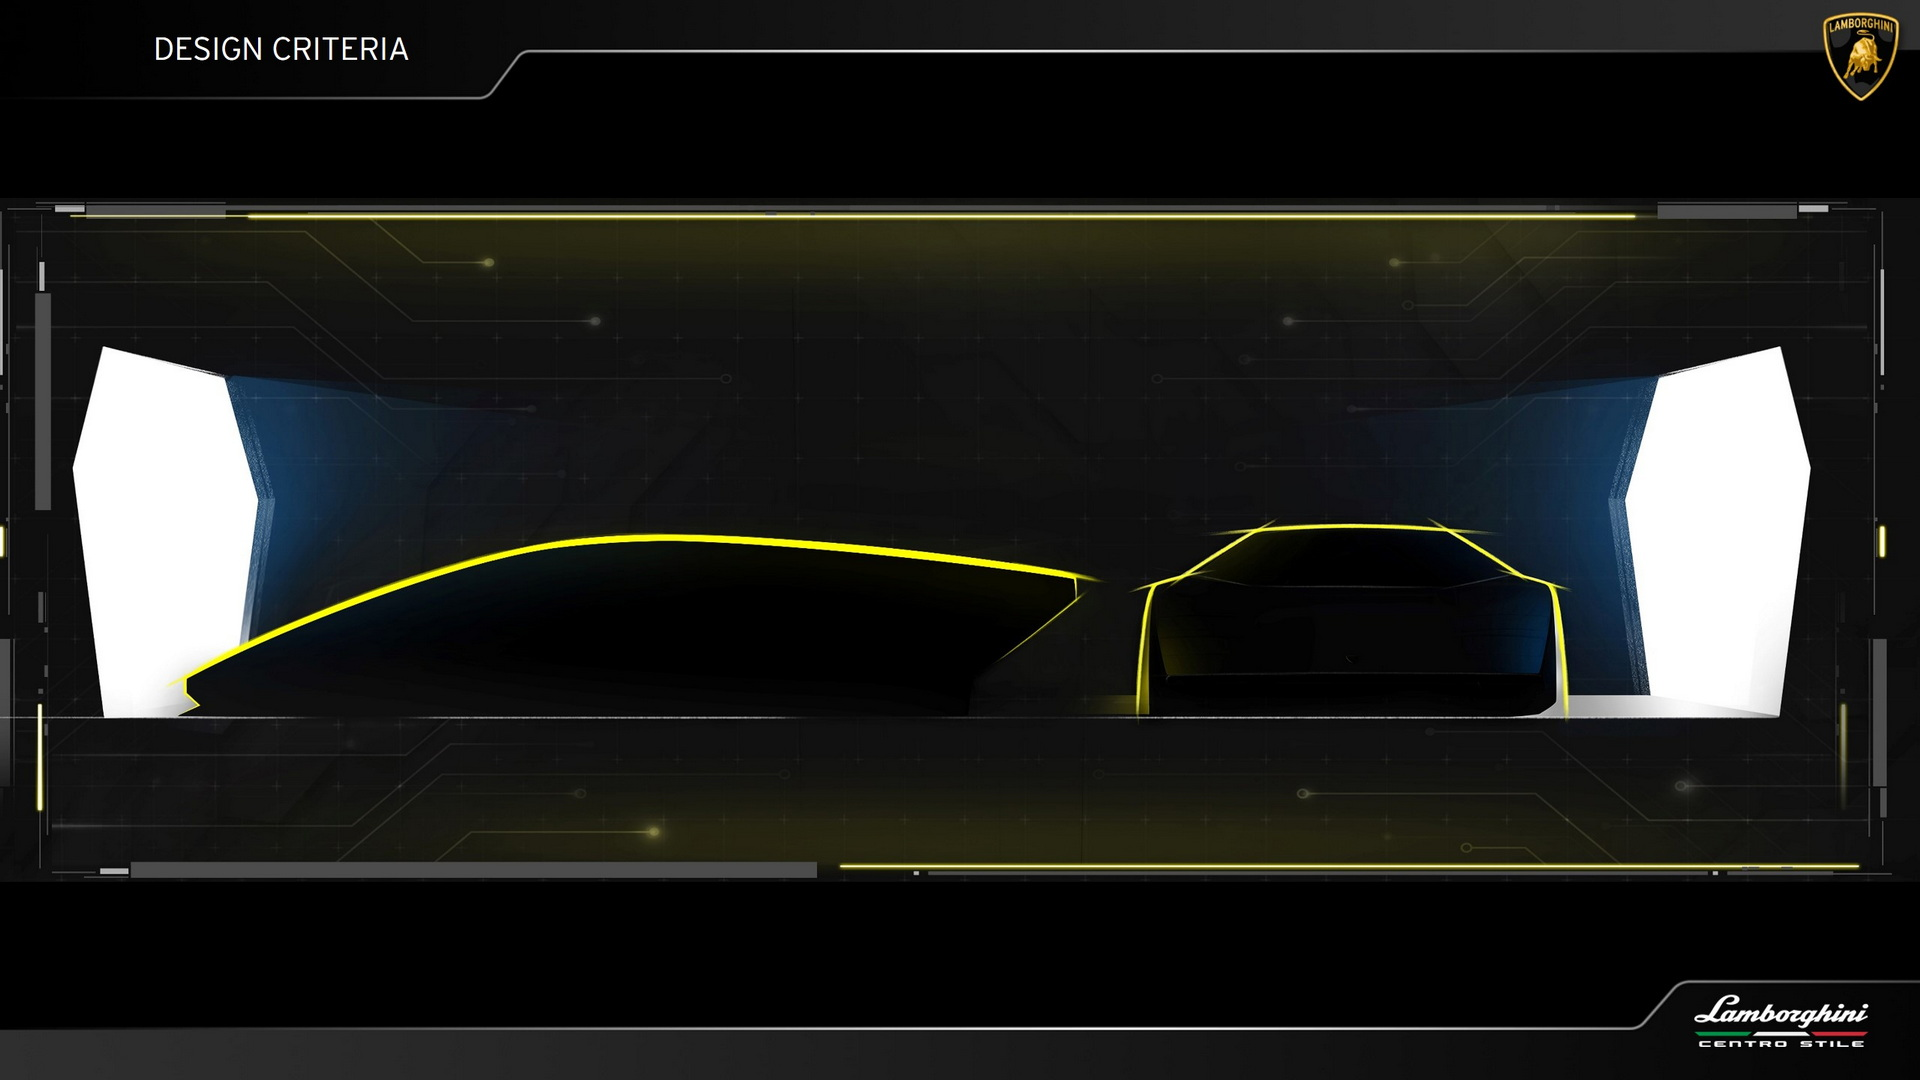 1971-Lamborghini-Countach-Design-DNA-1.jpg